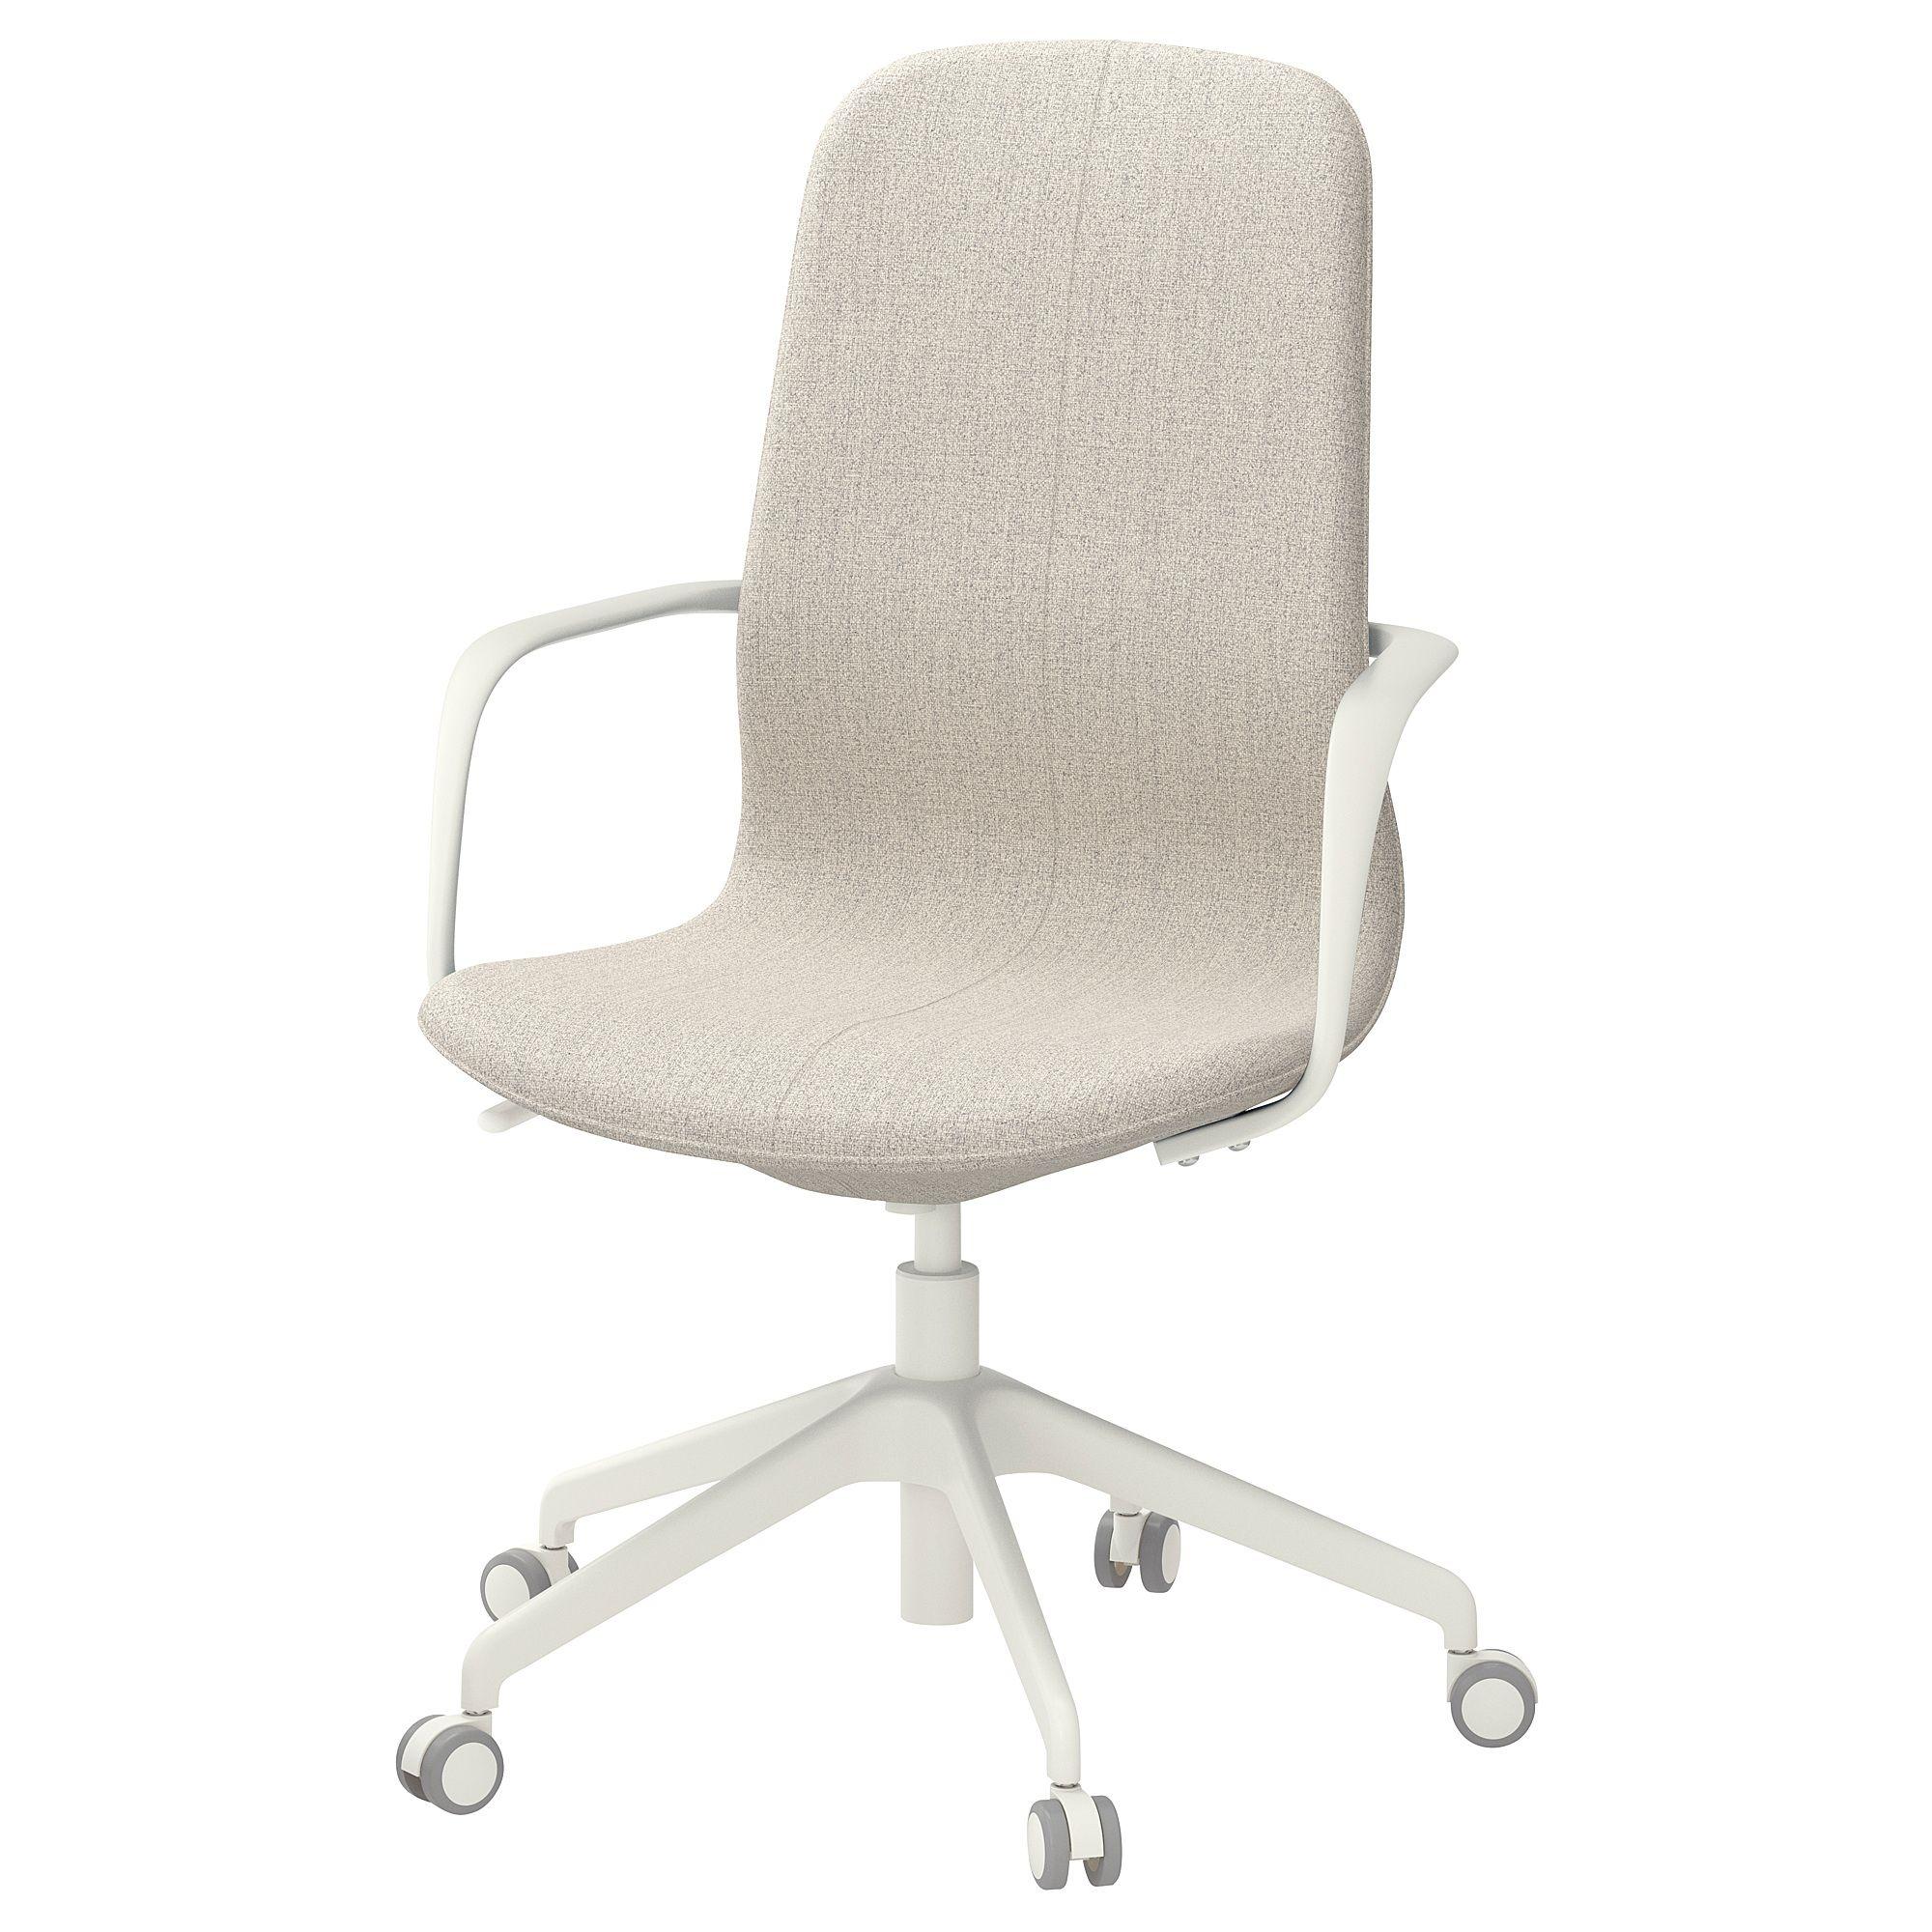 IKEA LÅNGFJÄLL Office chair with armrests Gunnared beige